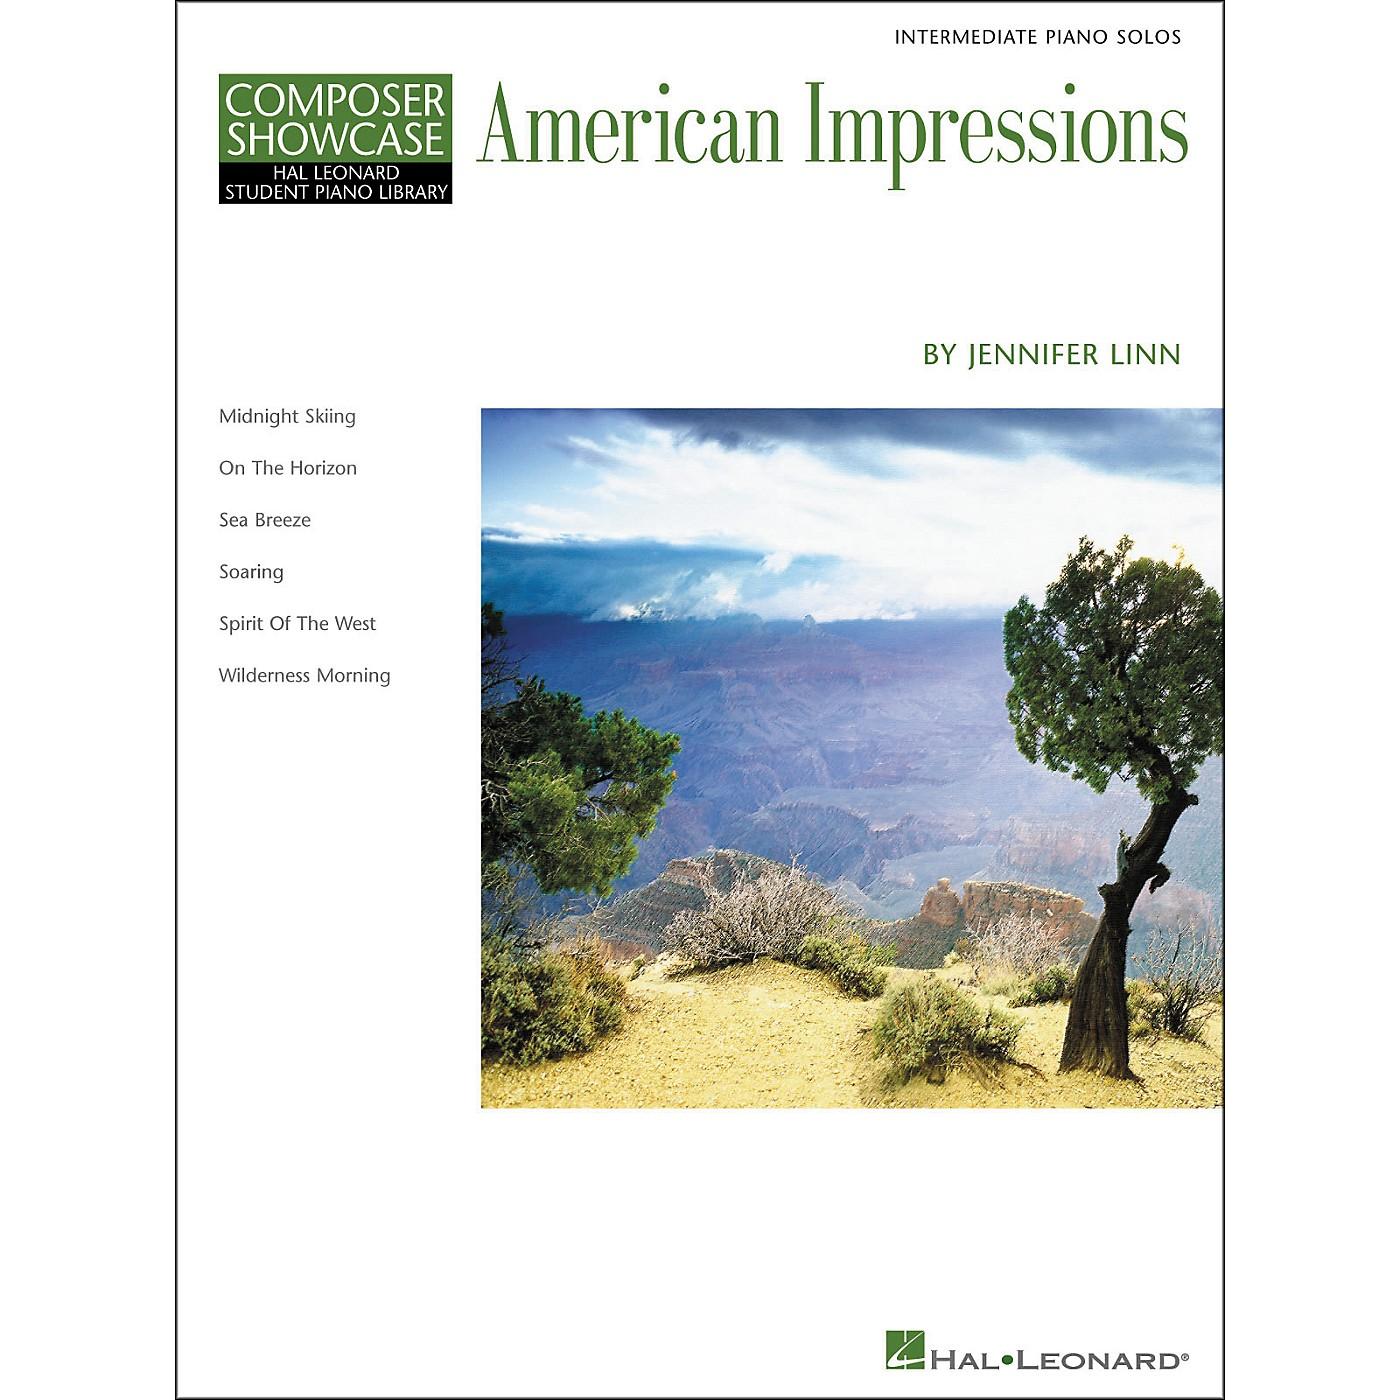 Hal Leonard American Impressions - Composer Showcase Series Intermediate Hal Leonard Student Piano Library by Jennifer Linn thumbnail